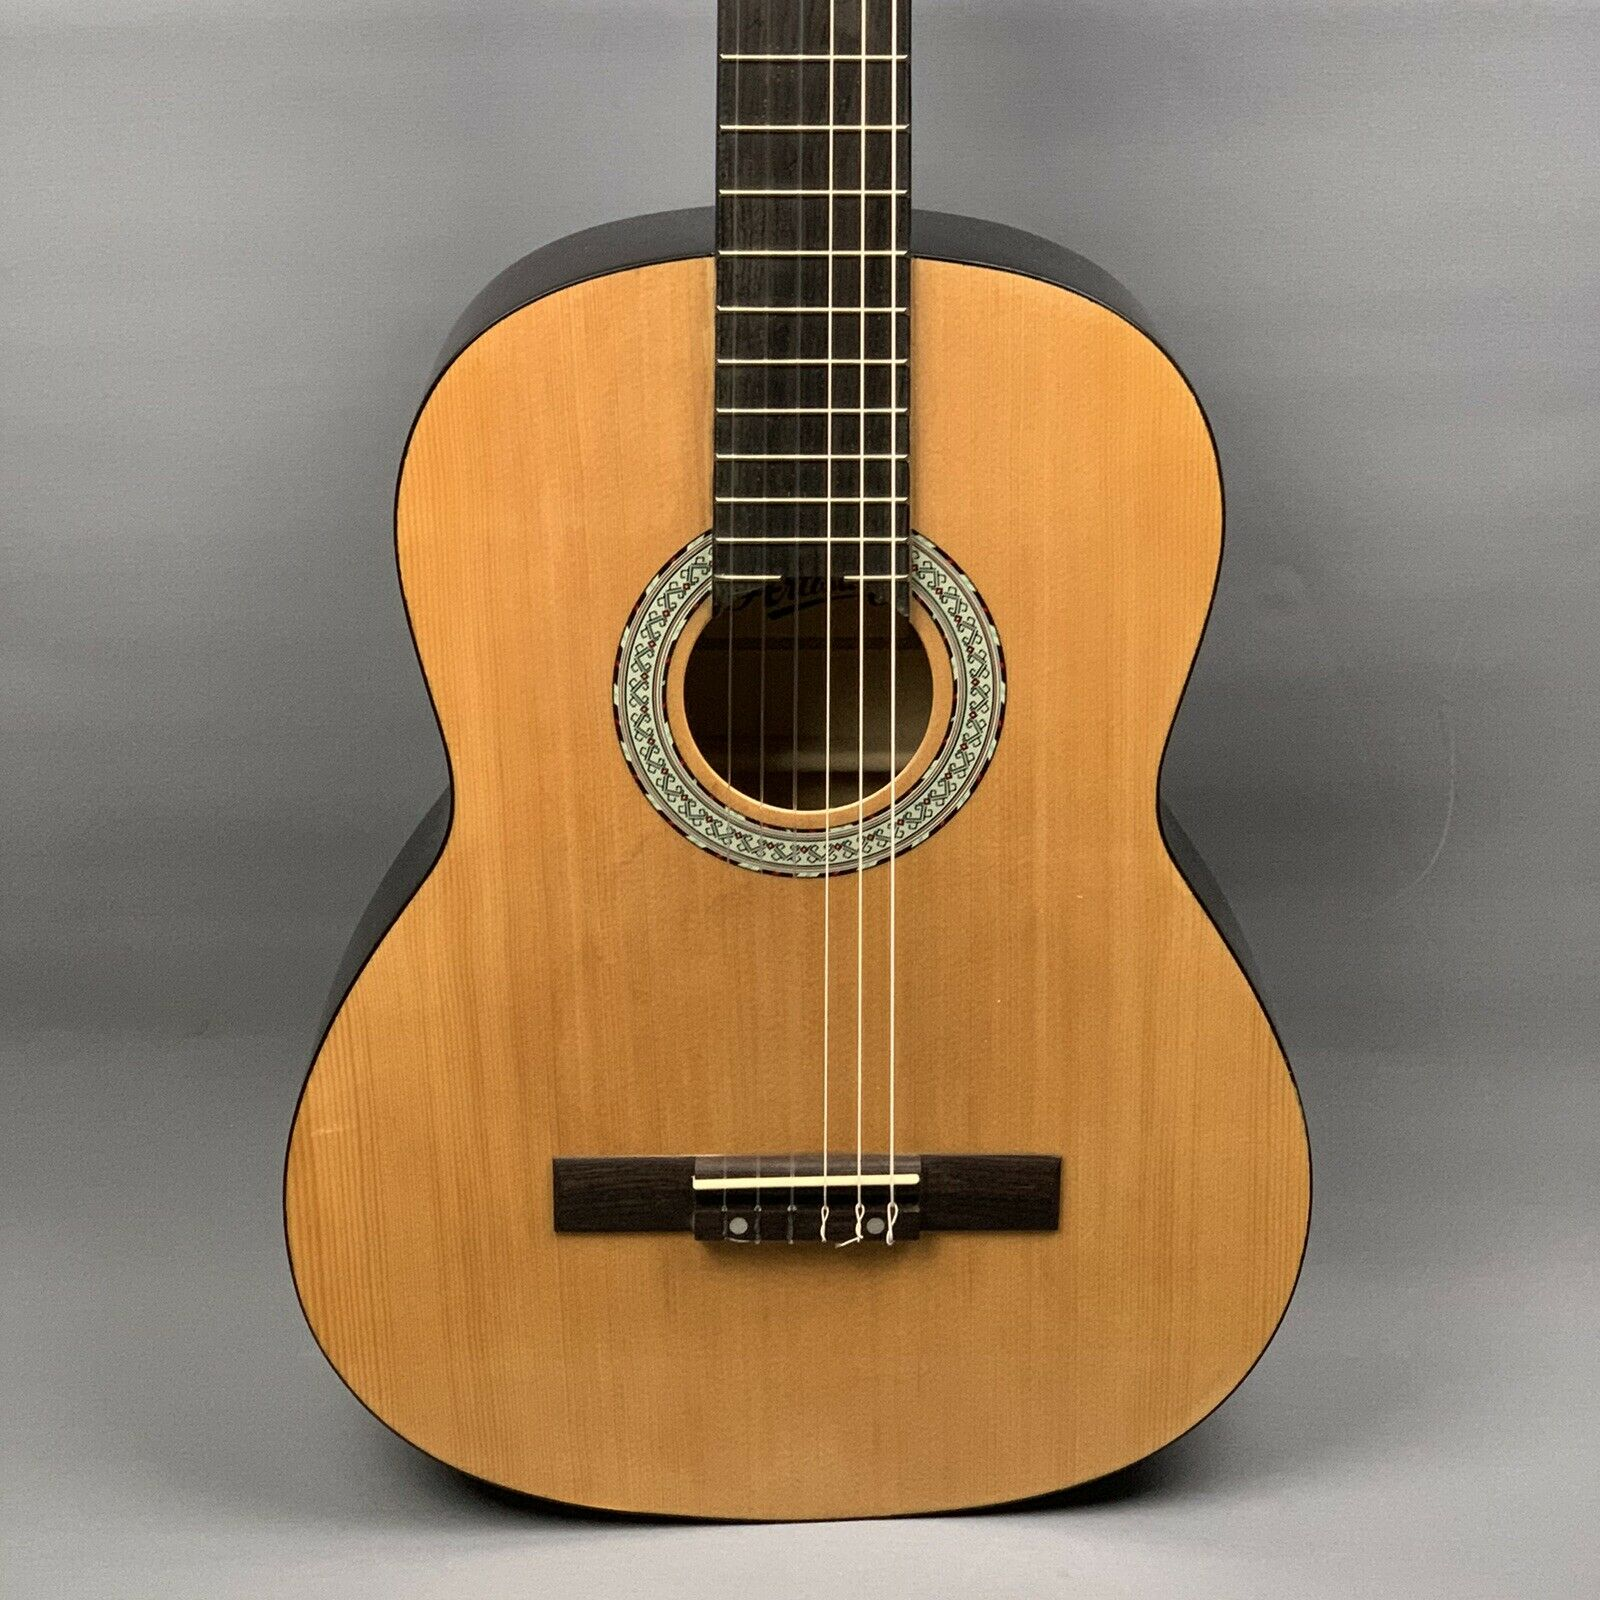 New  Artisan Classical Guitar  4 4 Größe  Student Nylon         Left Handed